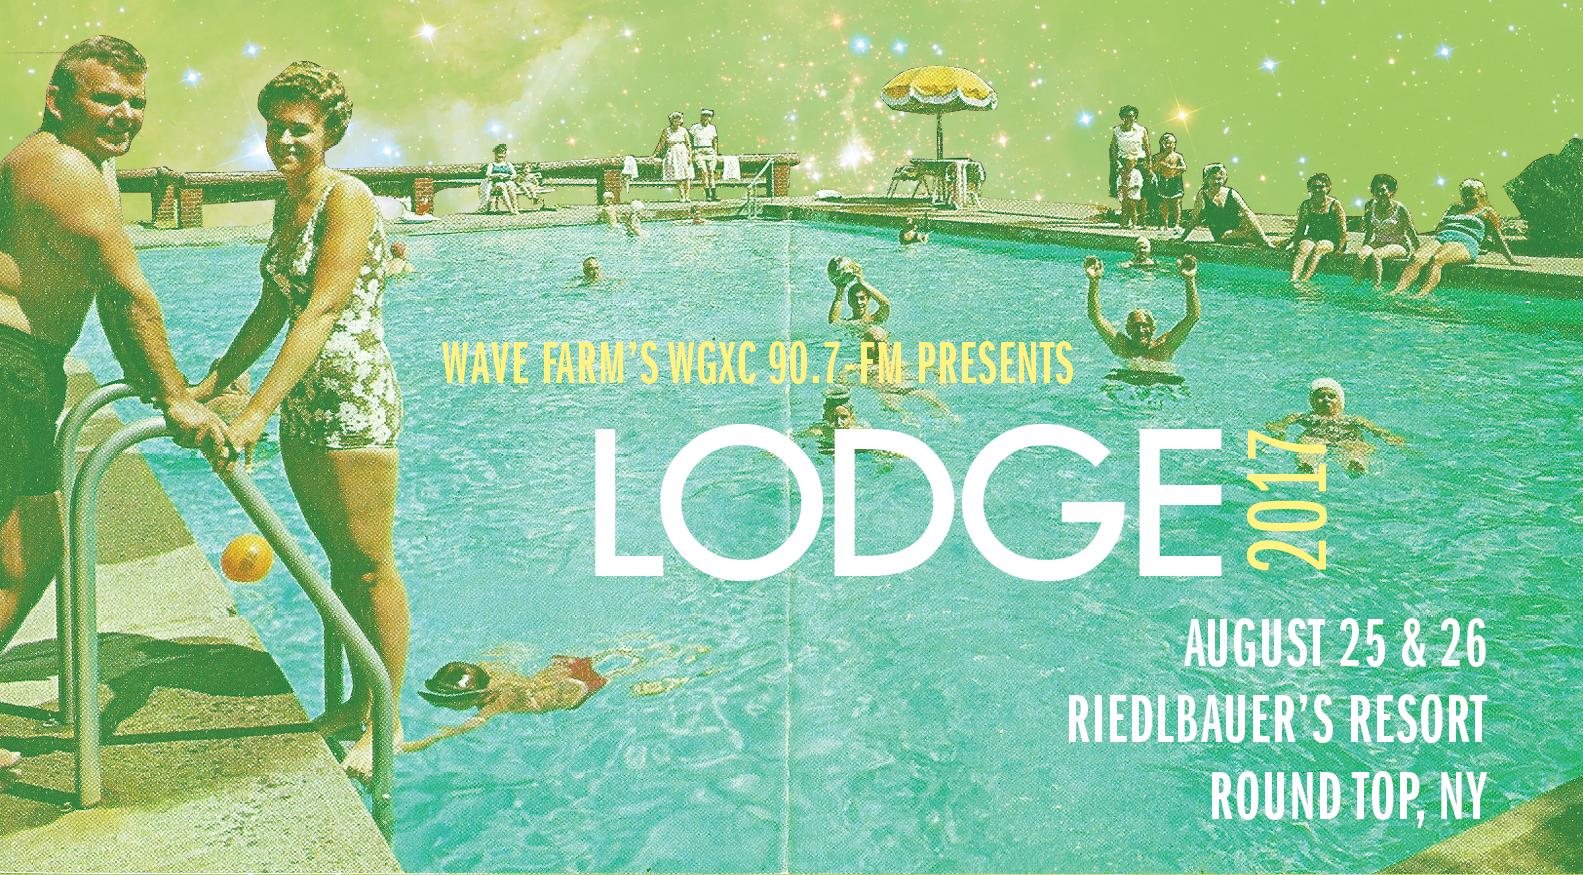 Lodge 2017 image.